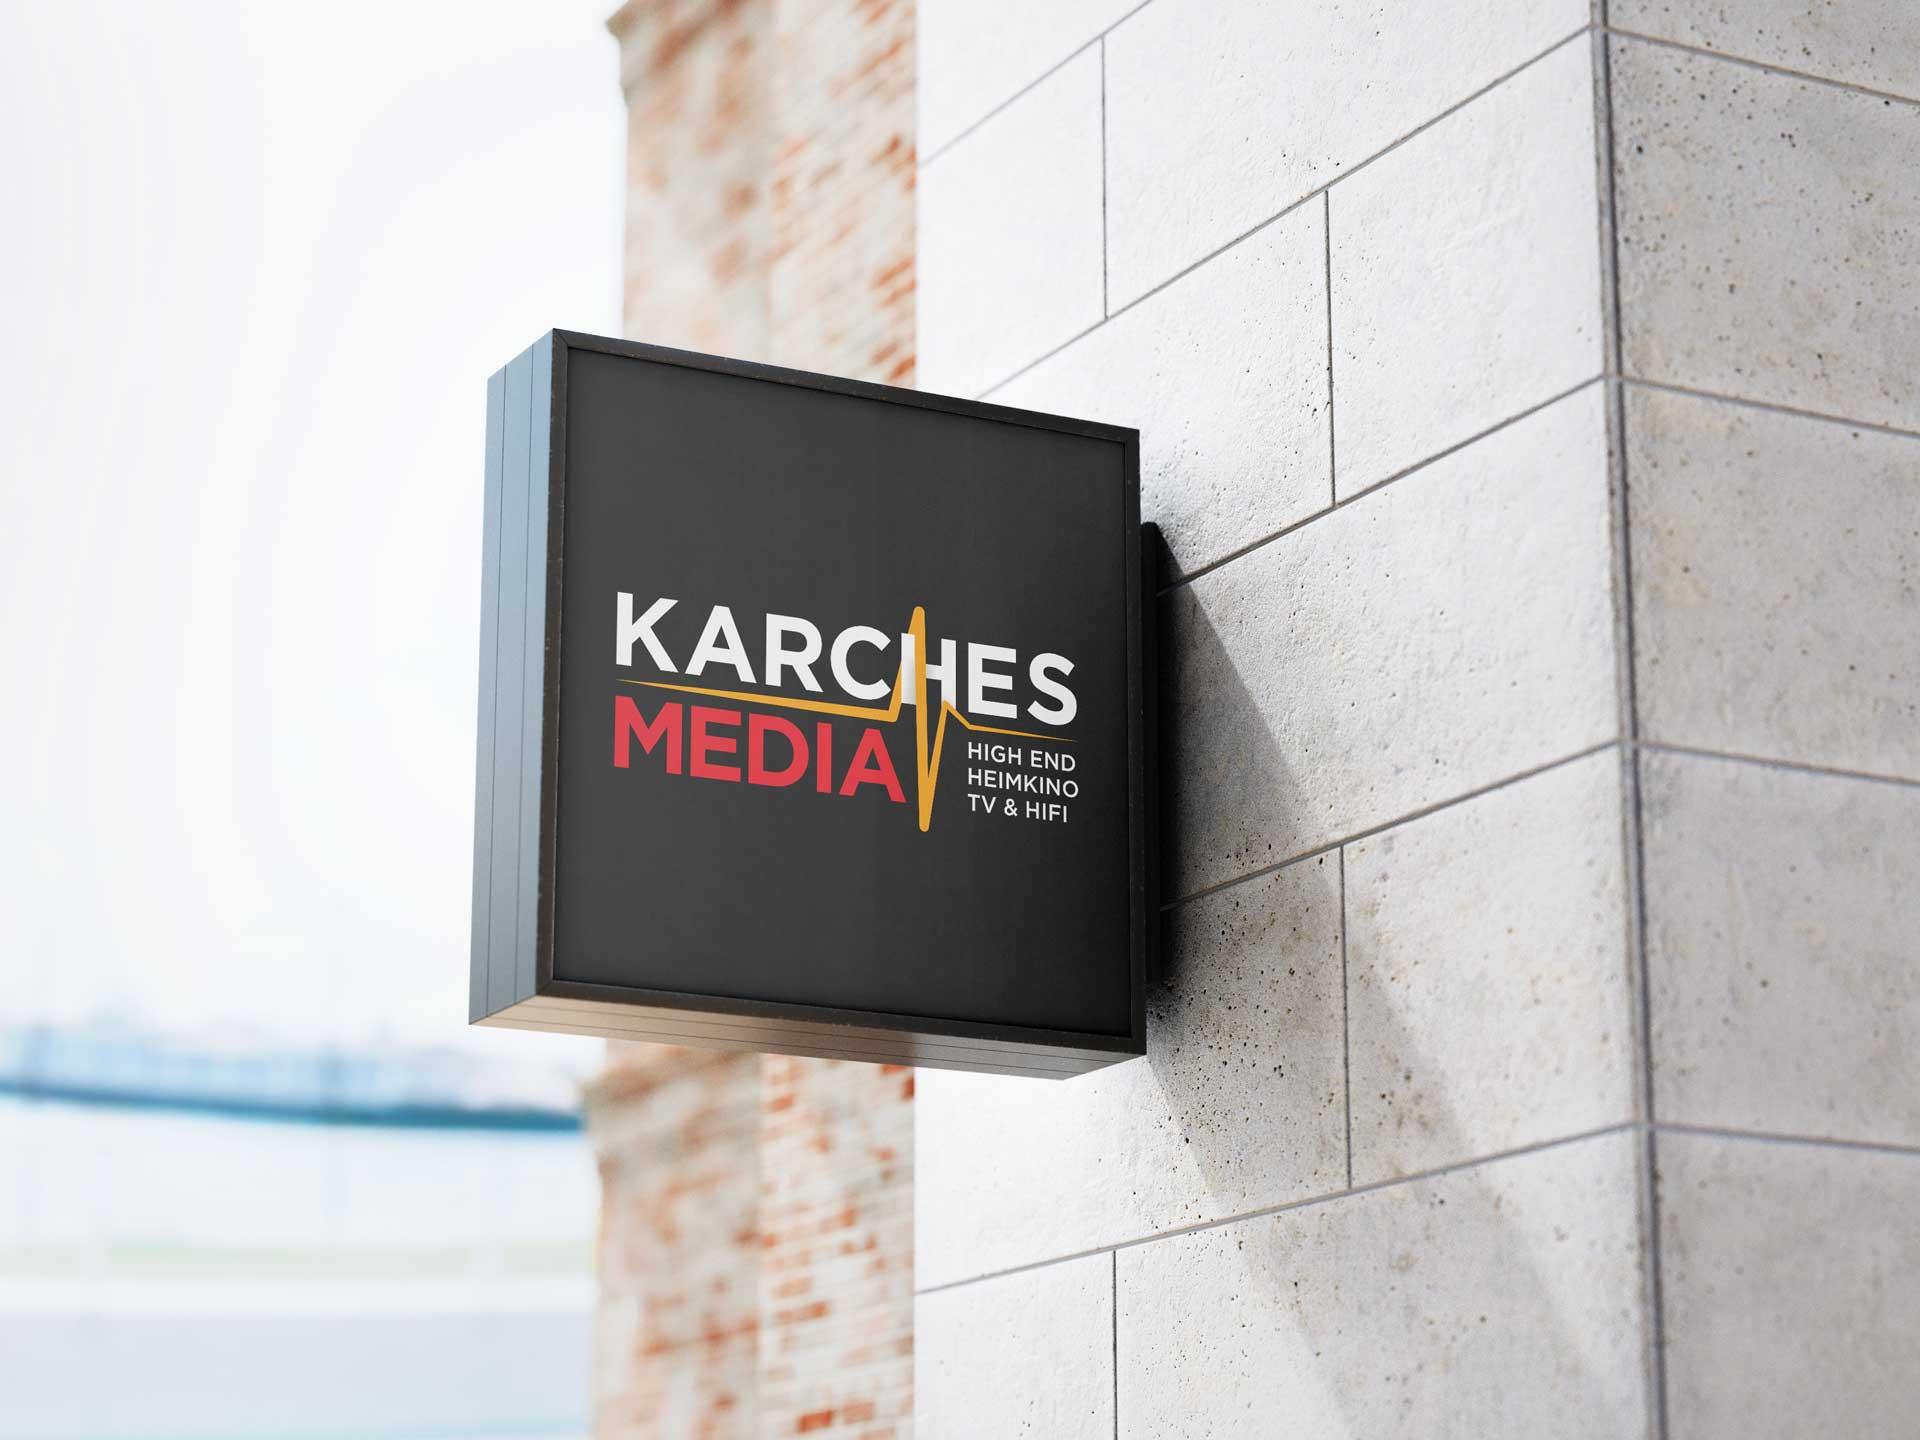 Karches_Media_Storefront